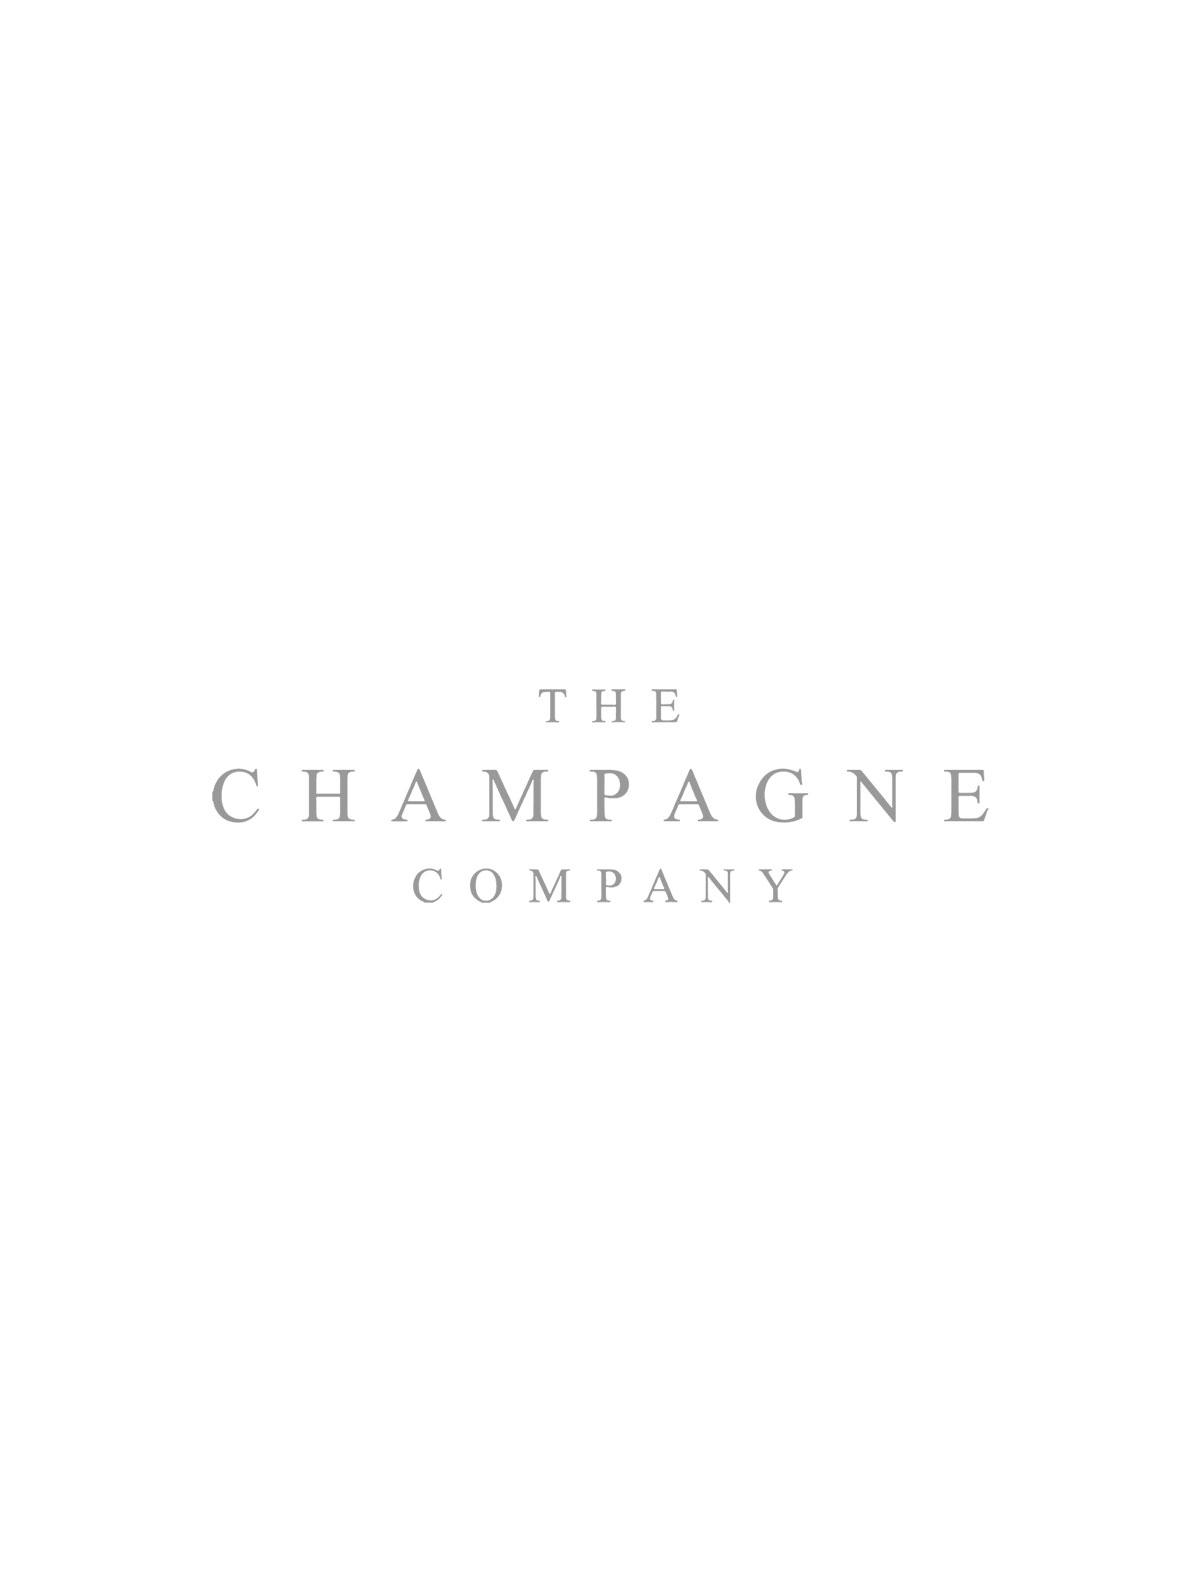 Nicolo Brut Reserve Champagne 75cl & Sea Salt Caramel Truffles 510g